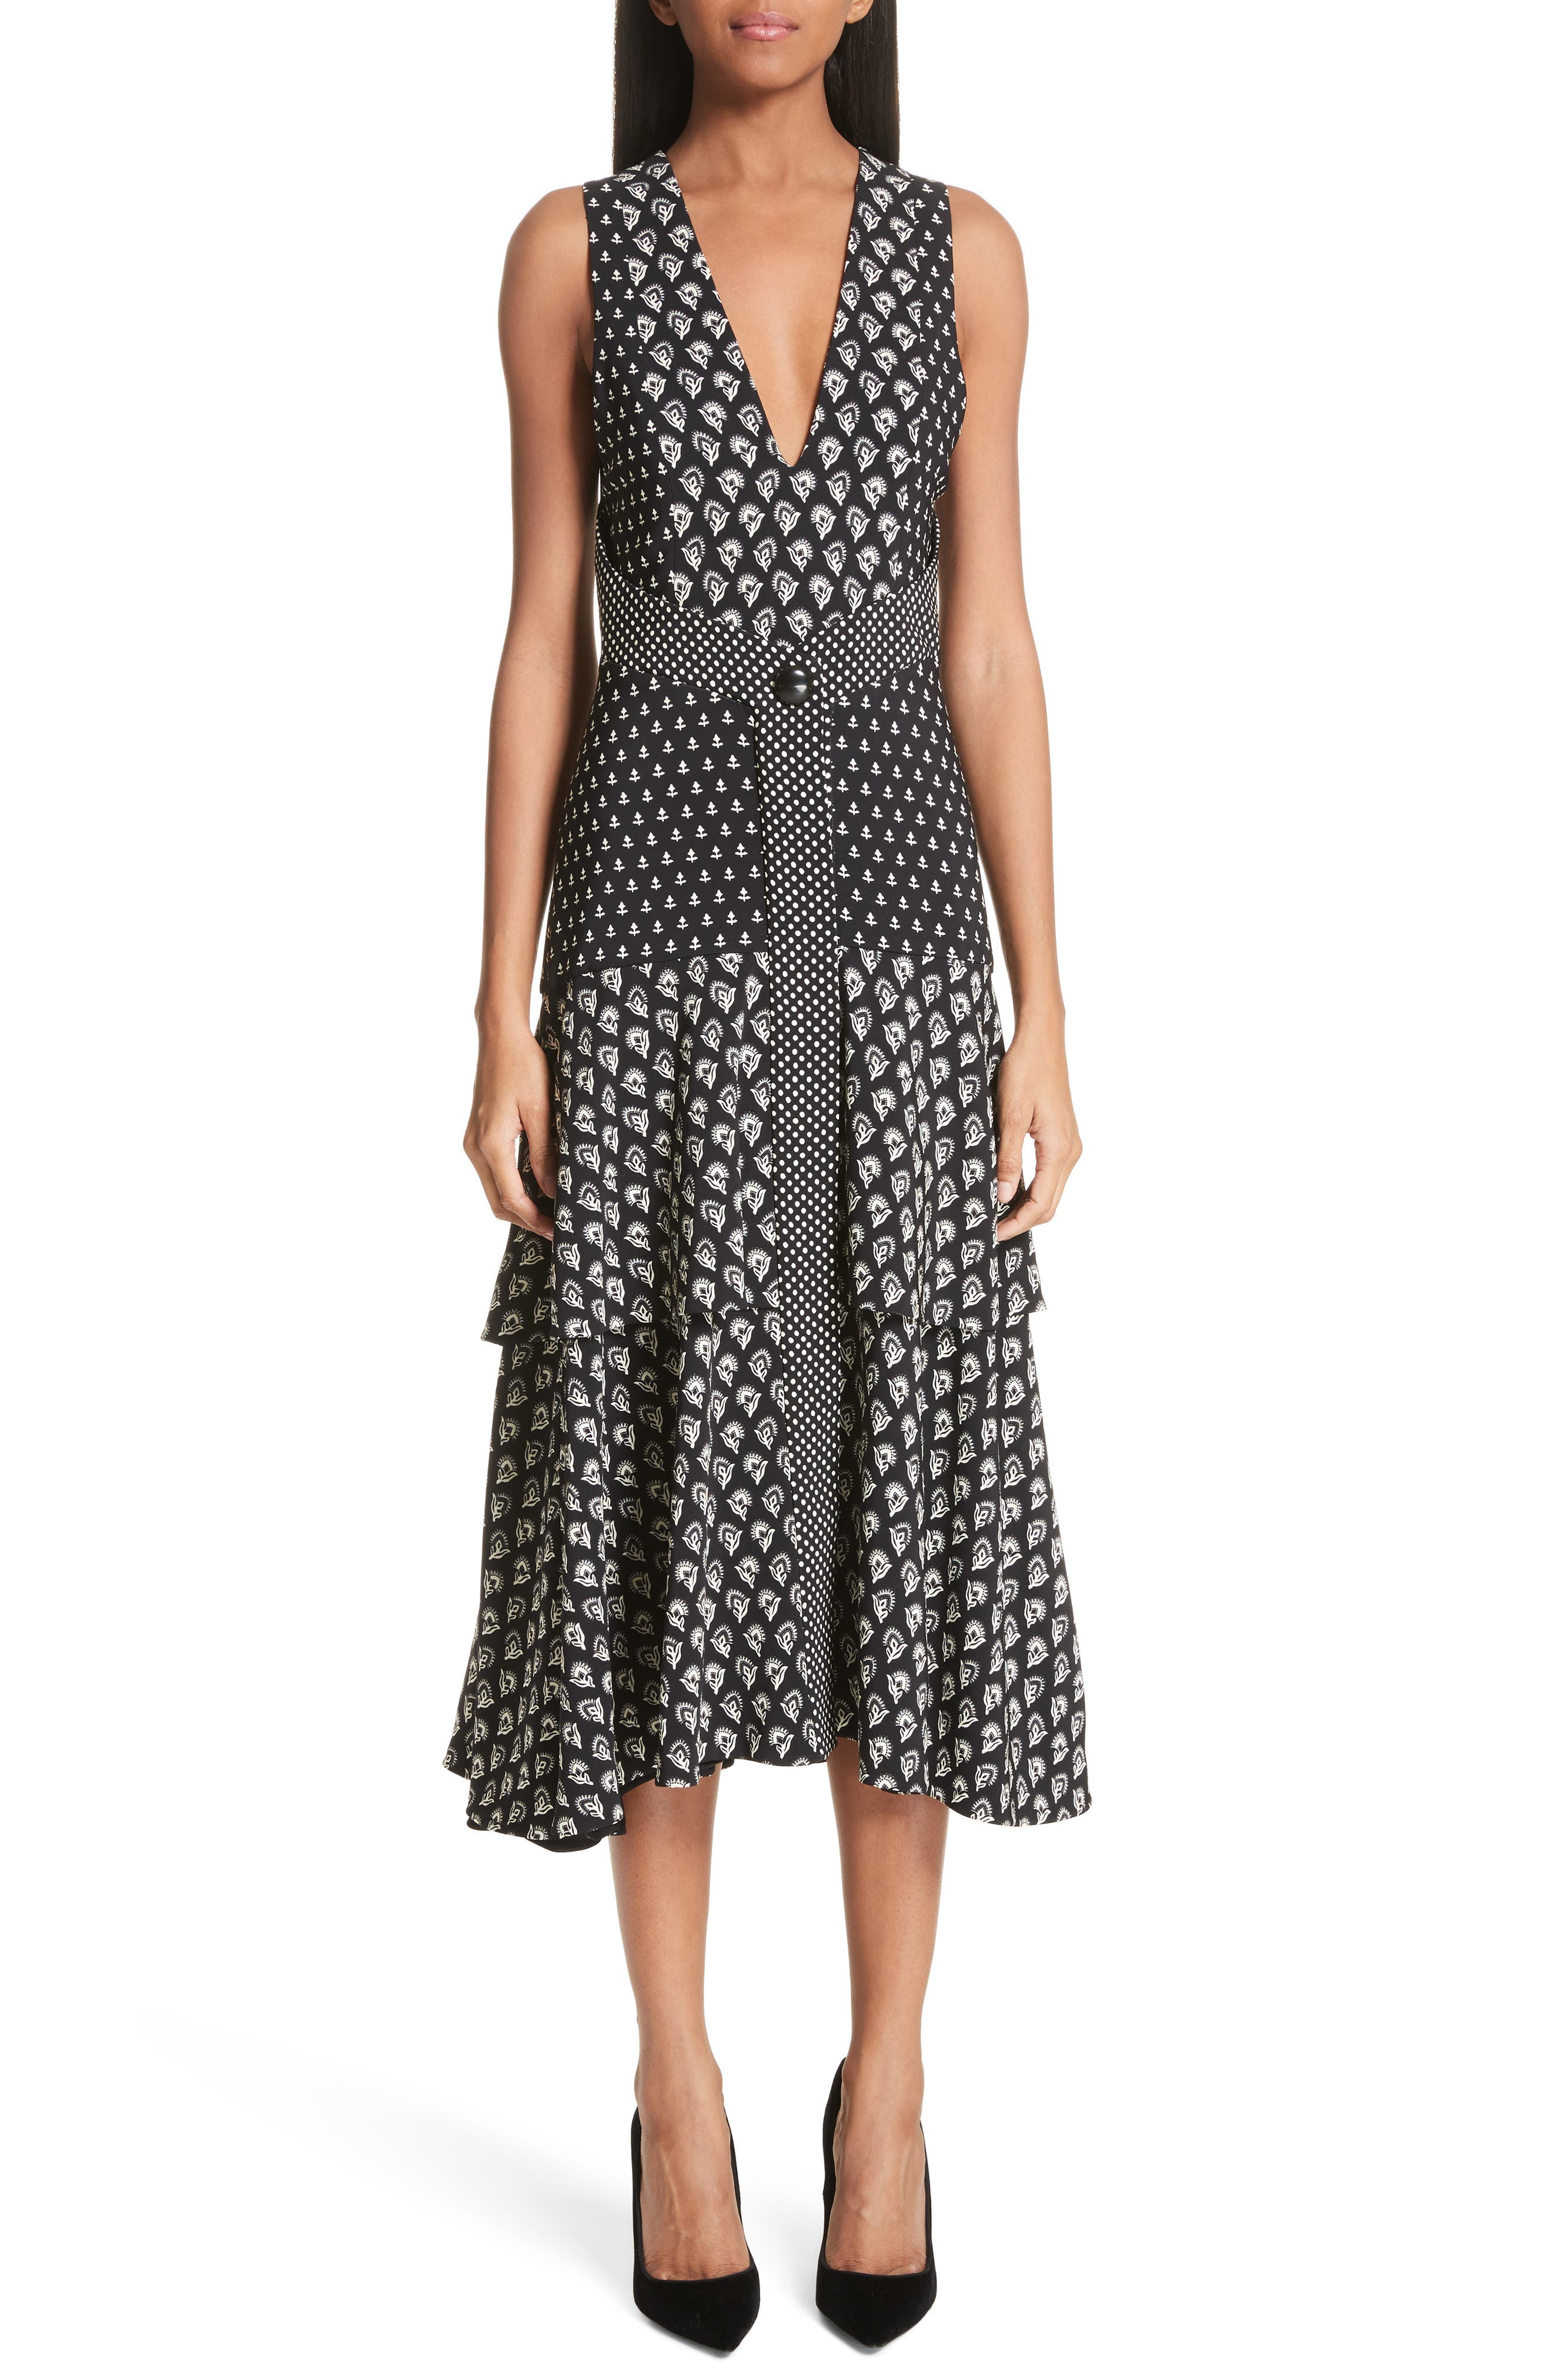 Proenza Schouler Mixed Print Button Detail Midi Dress, Black